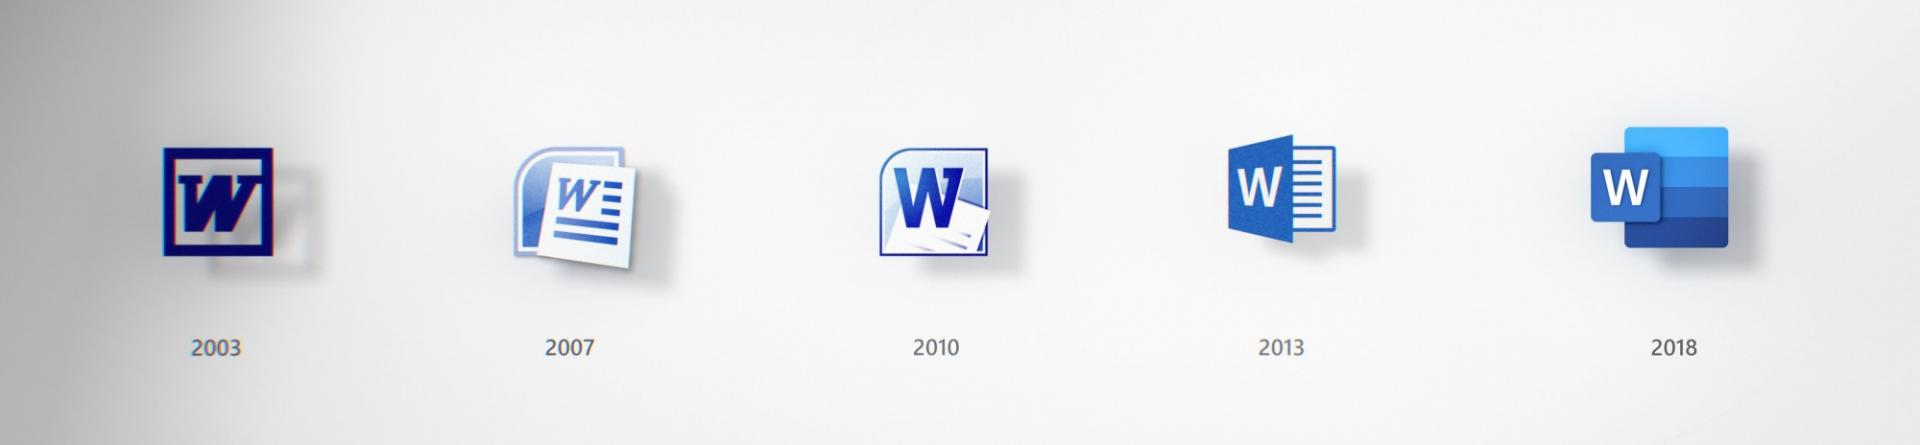 Microsoft Office меняет иконки